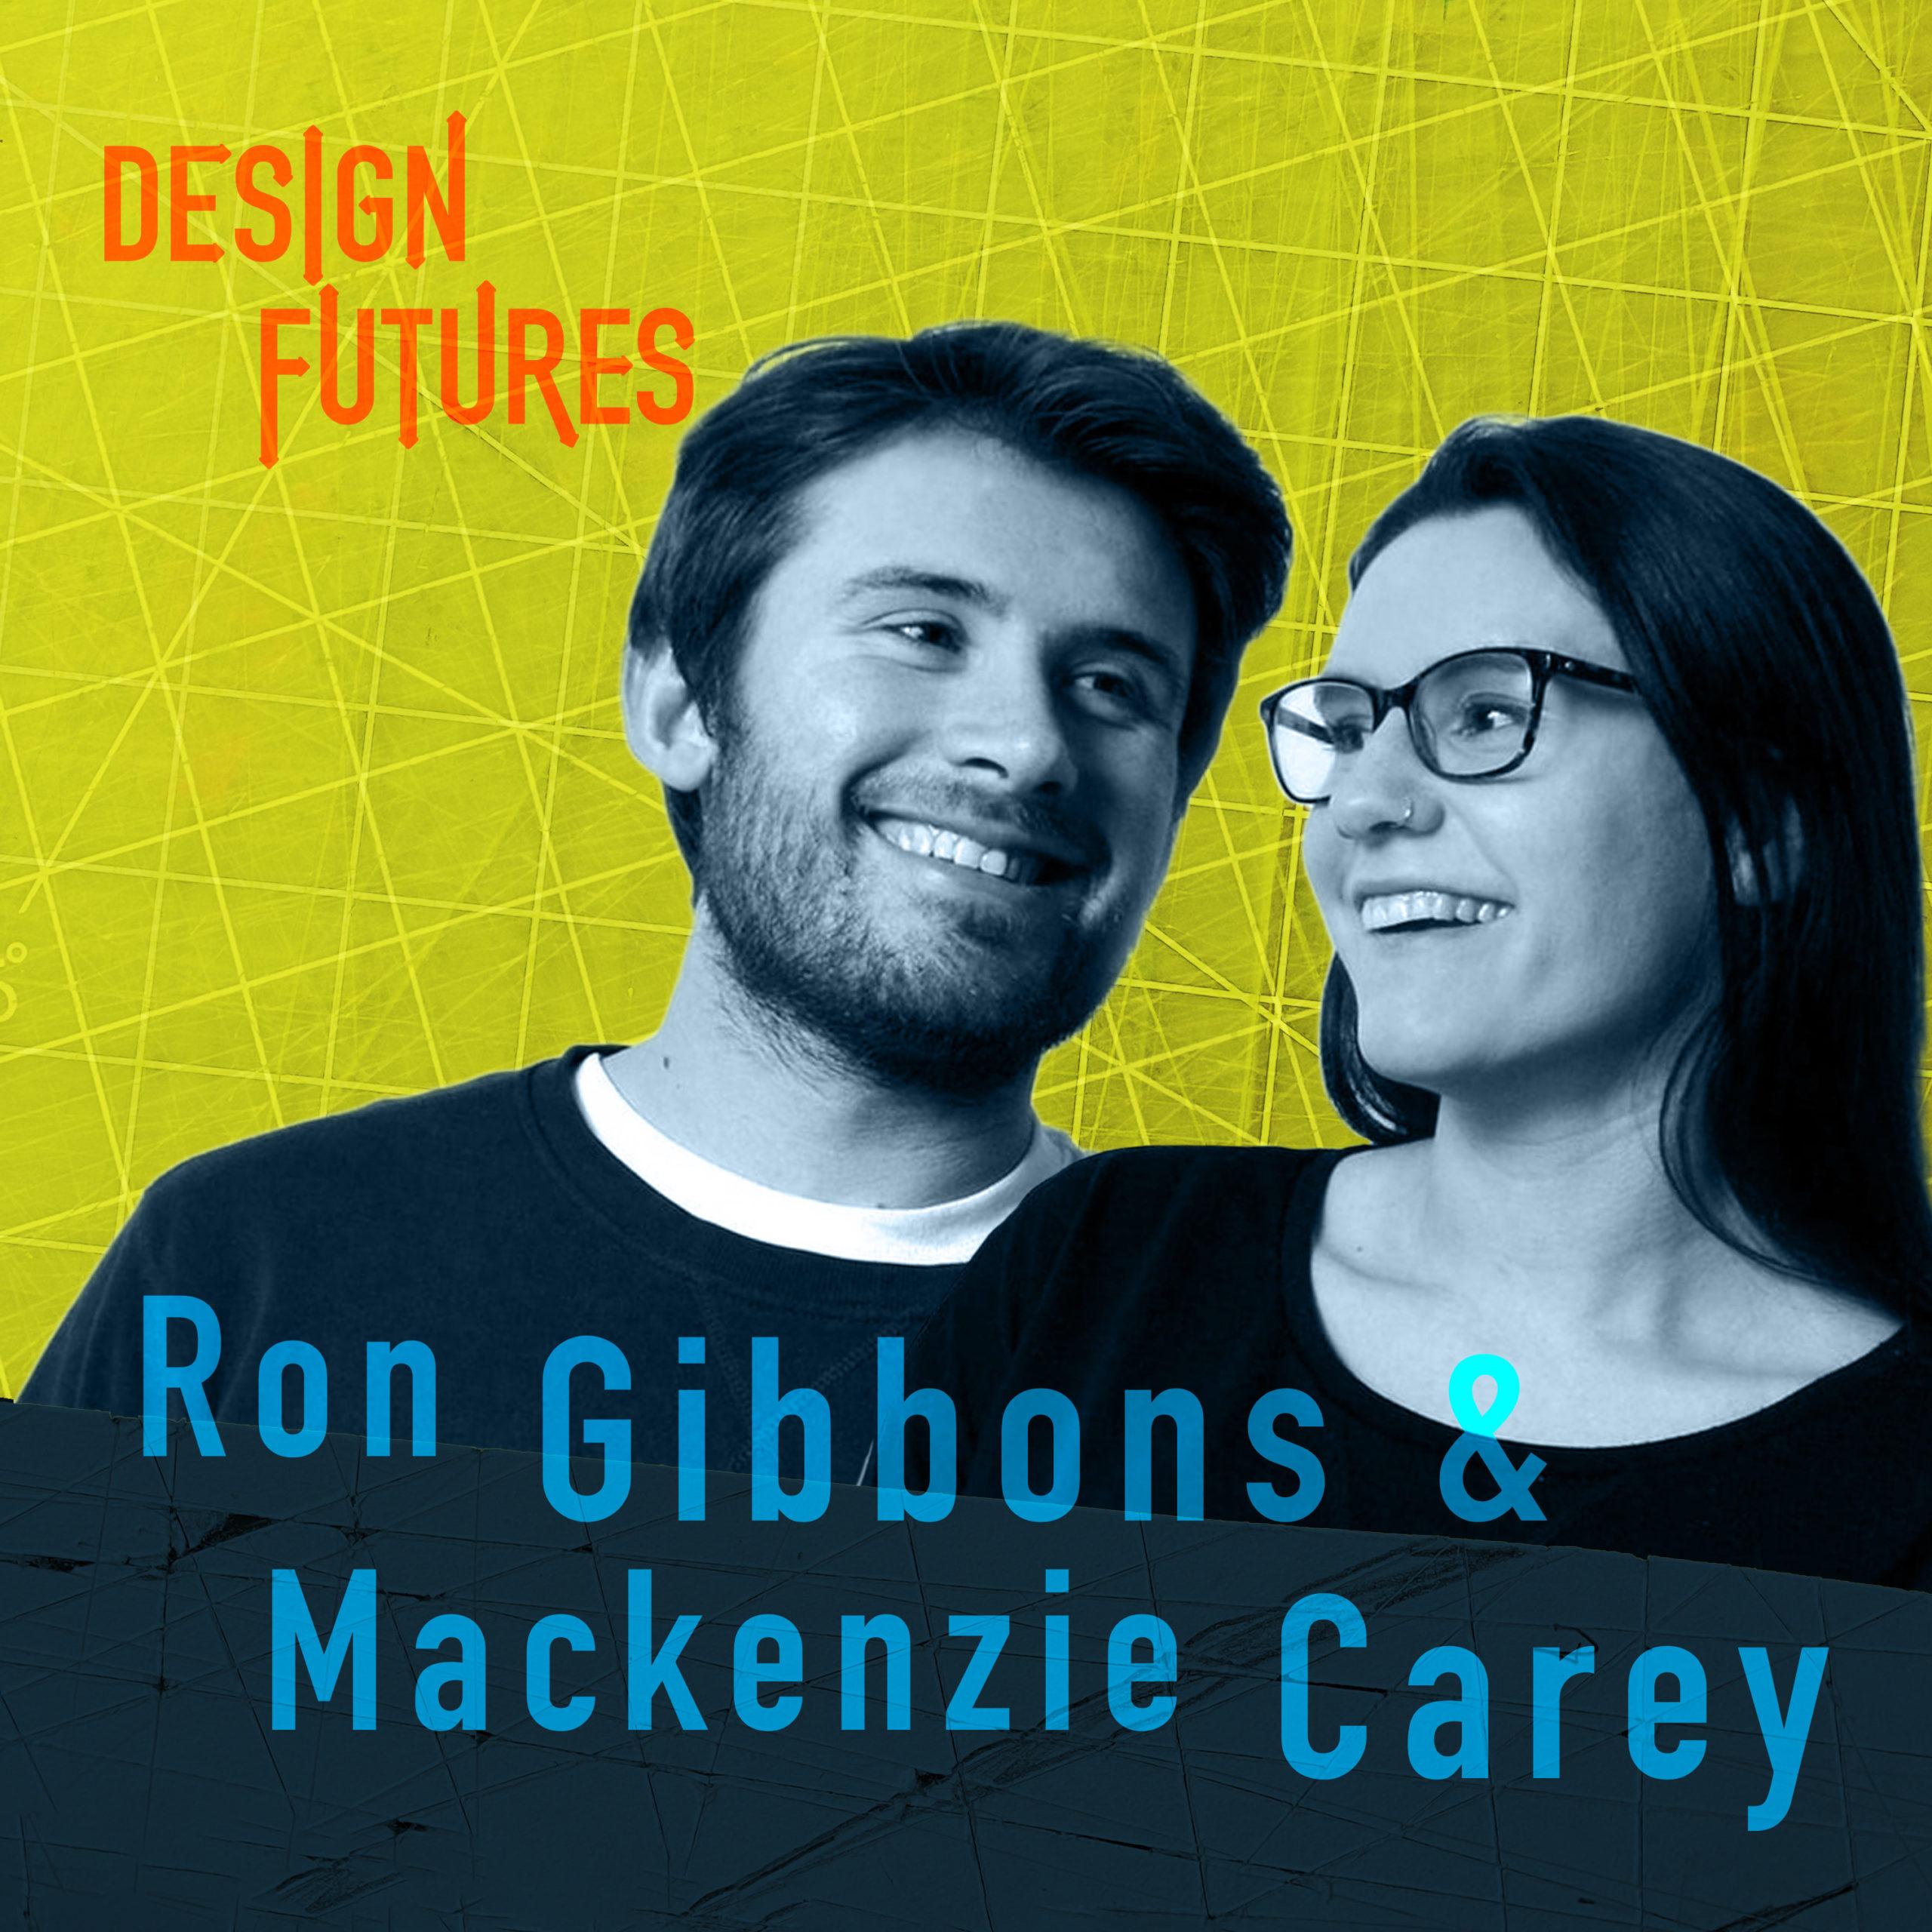 Ron Gibbons & Mackenzie Carey